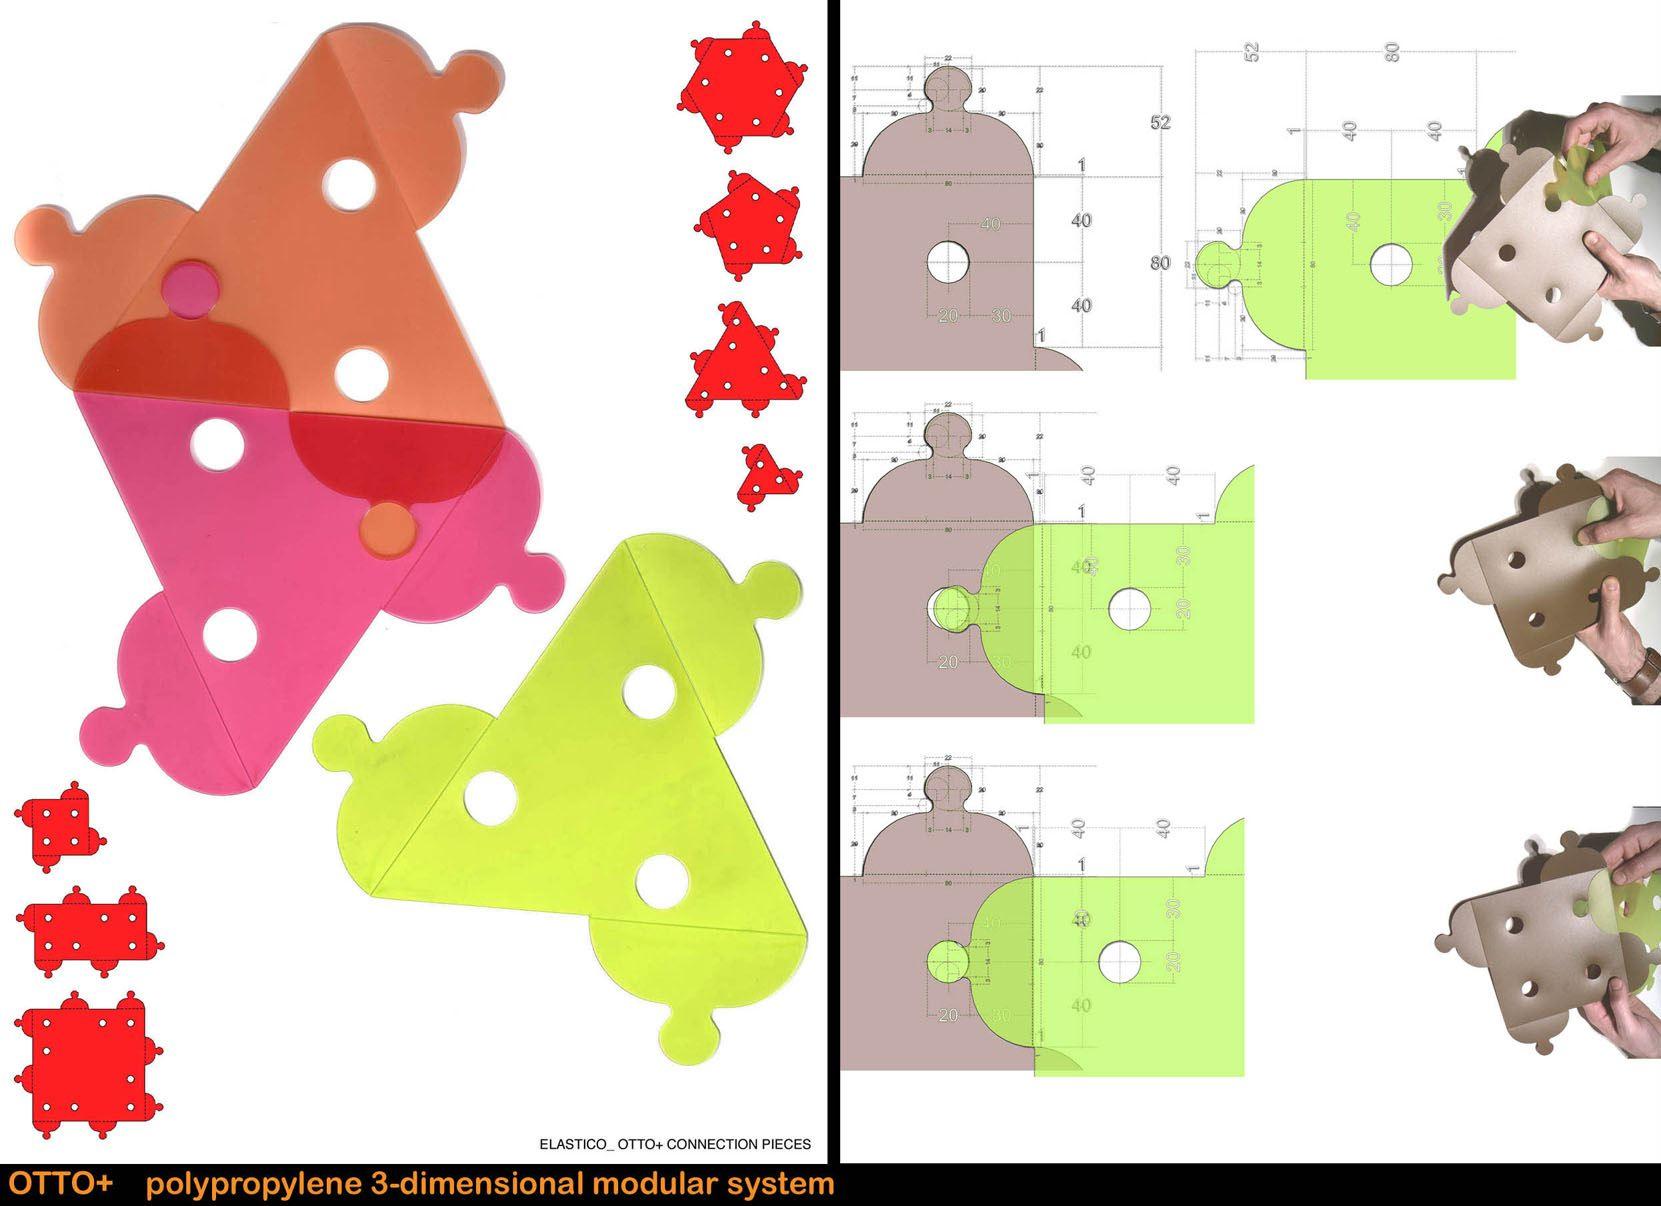 02 otto+ pieces.jpg